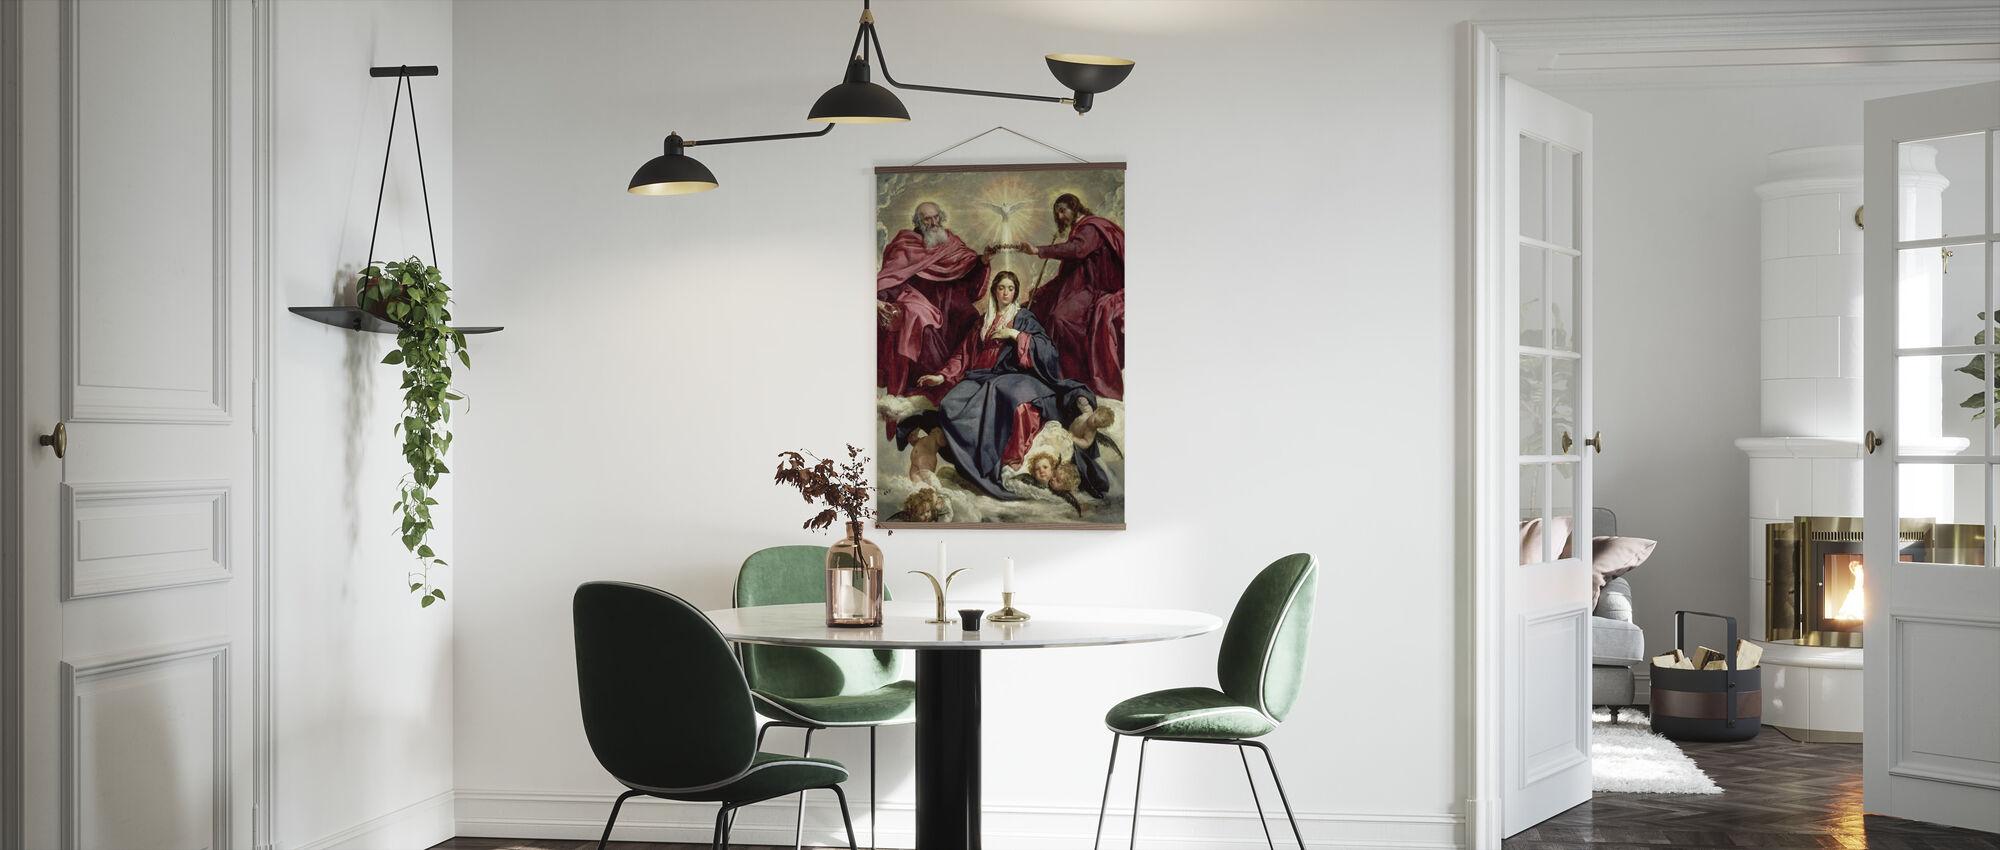 Coronation of the Virgin - Diego Velasquez - Poster - Kitchen